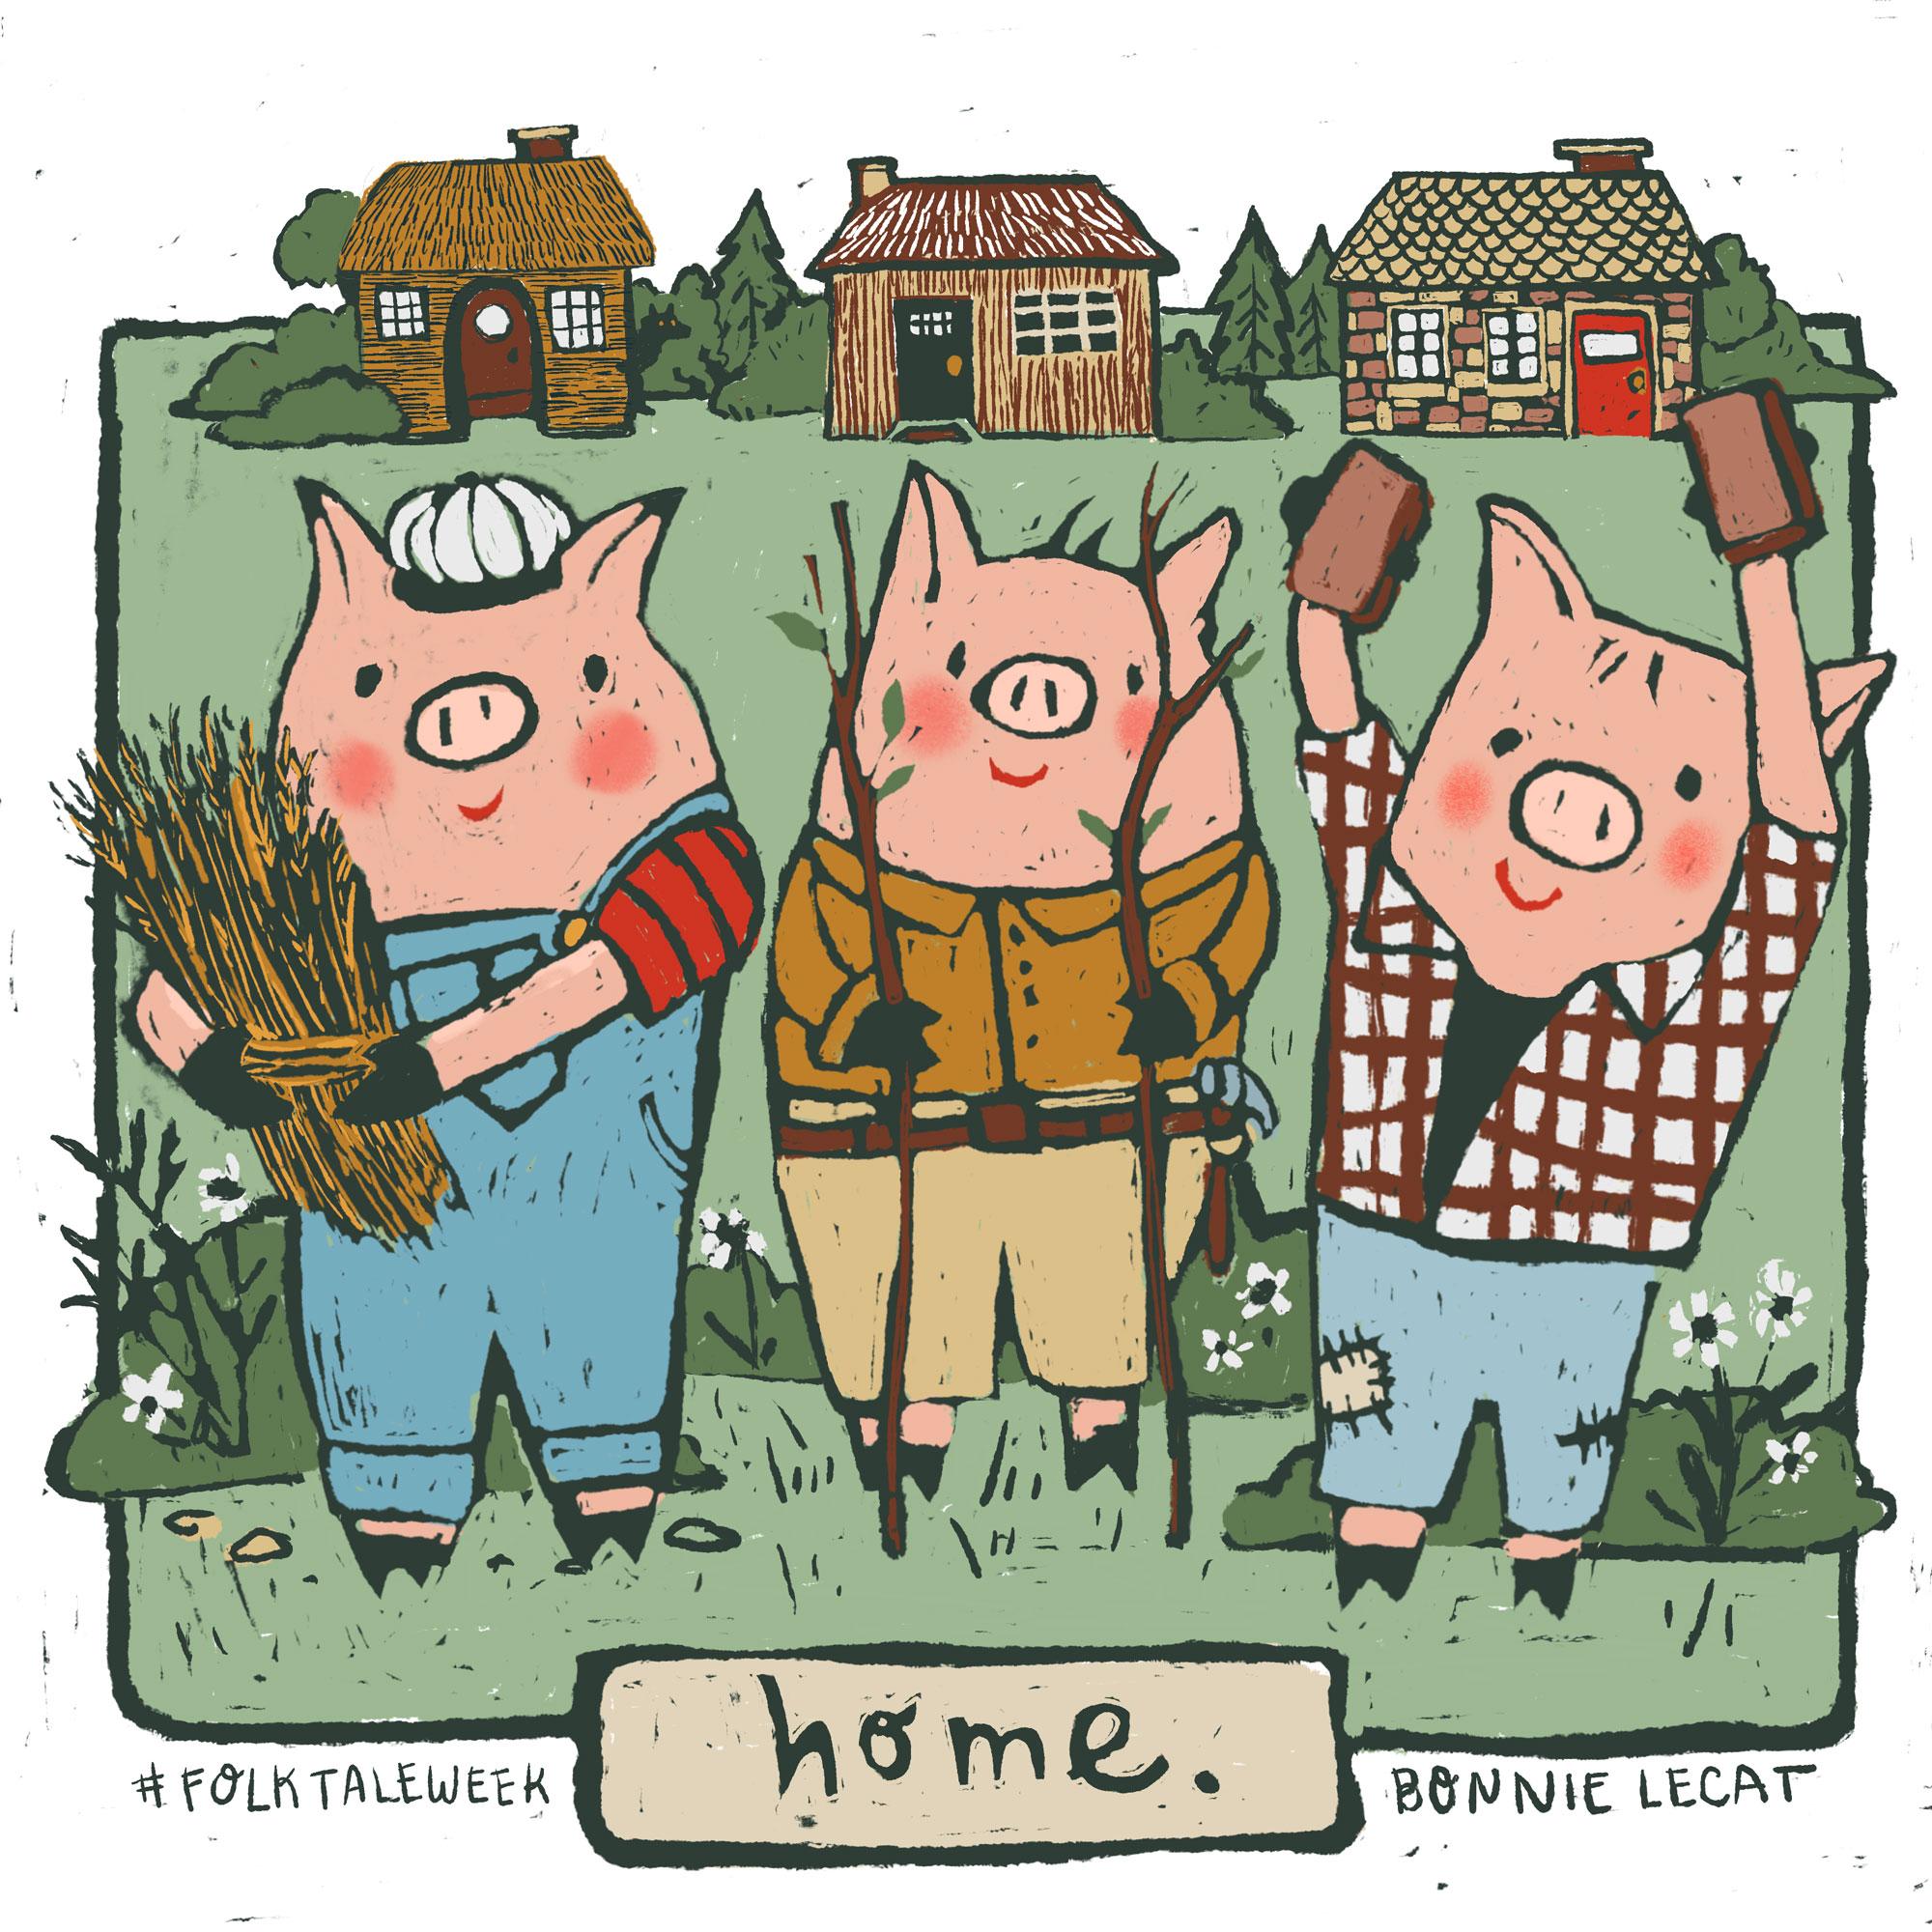 Three Little Pigs by Bonnie Lecat